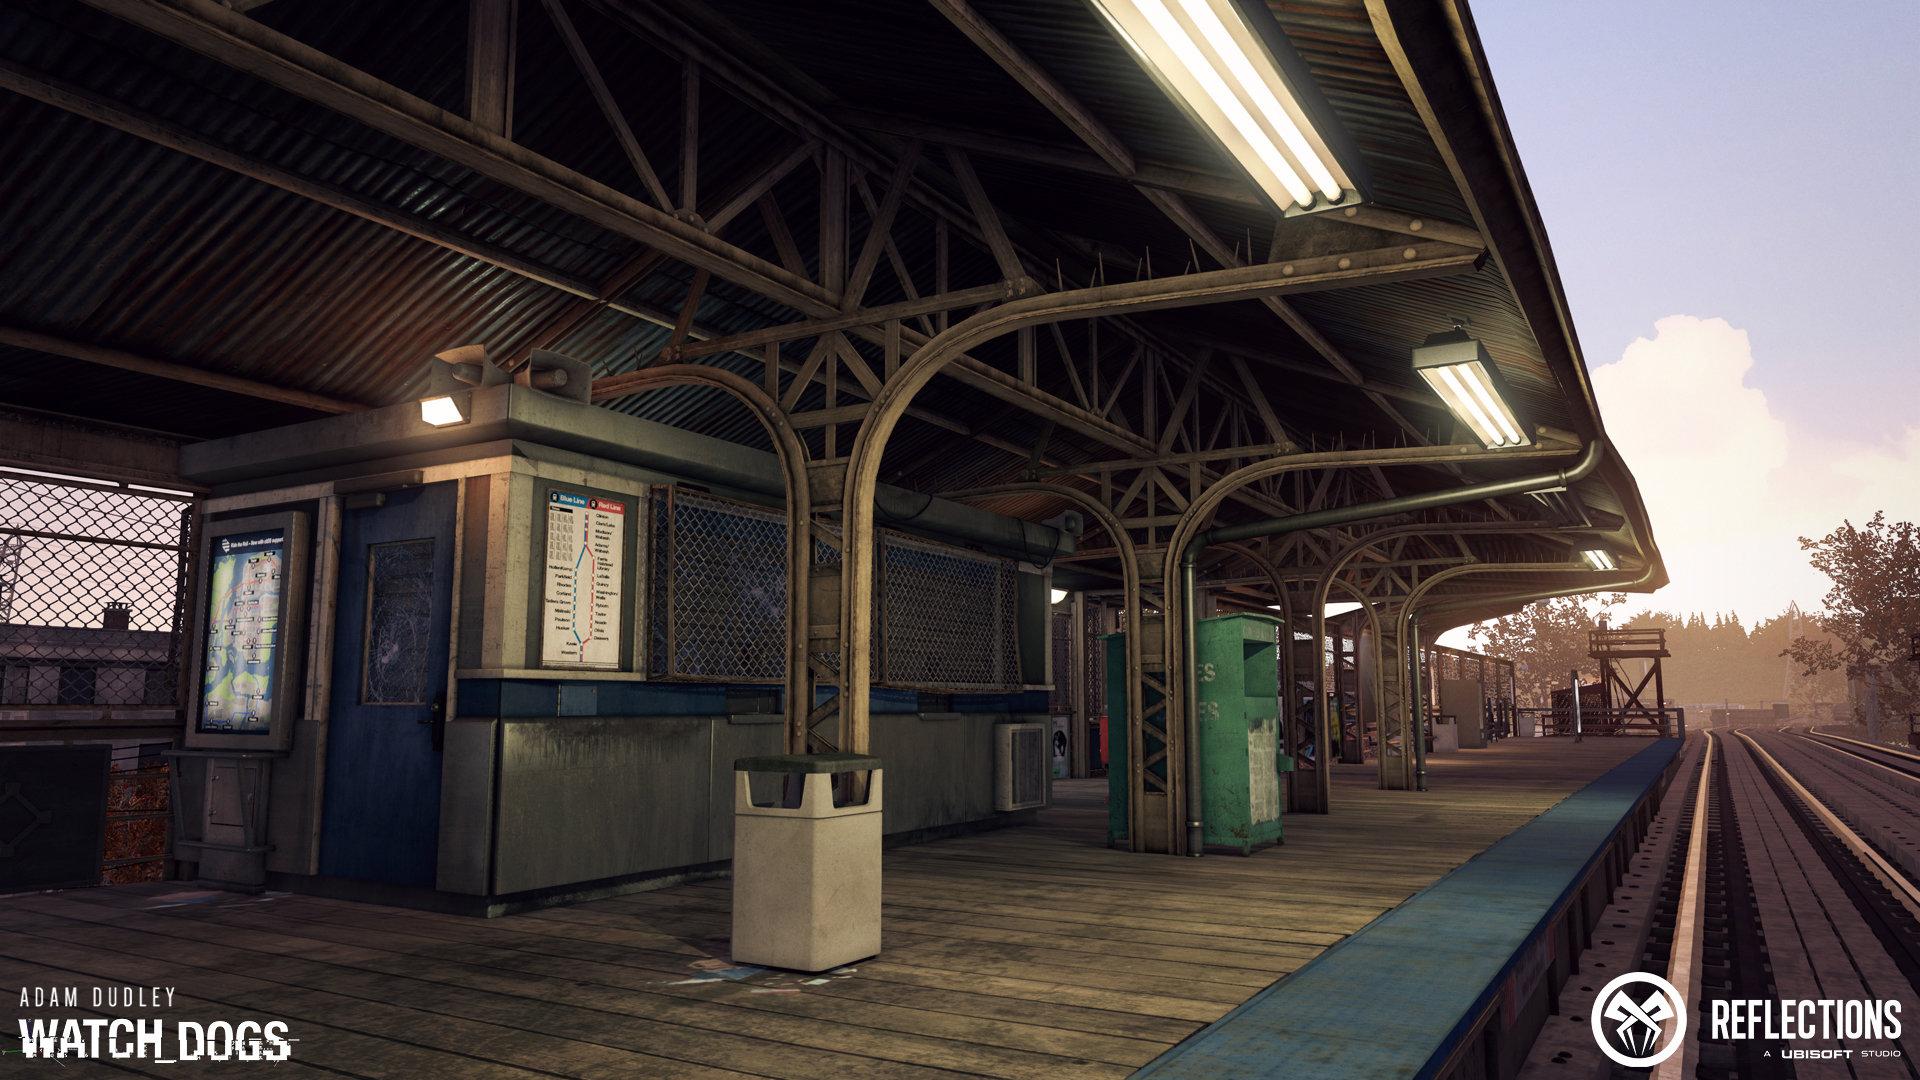 Adam dudley wards station 02